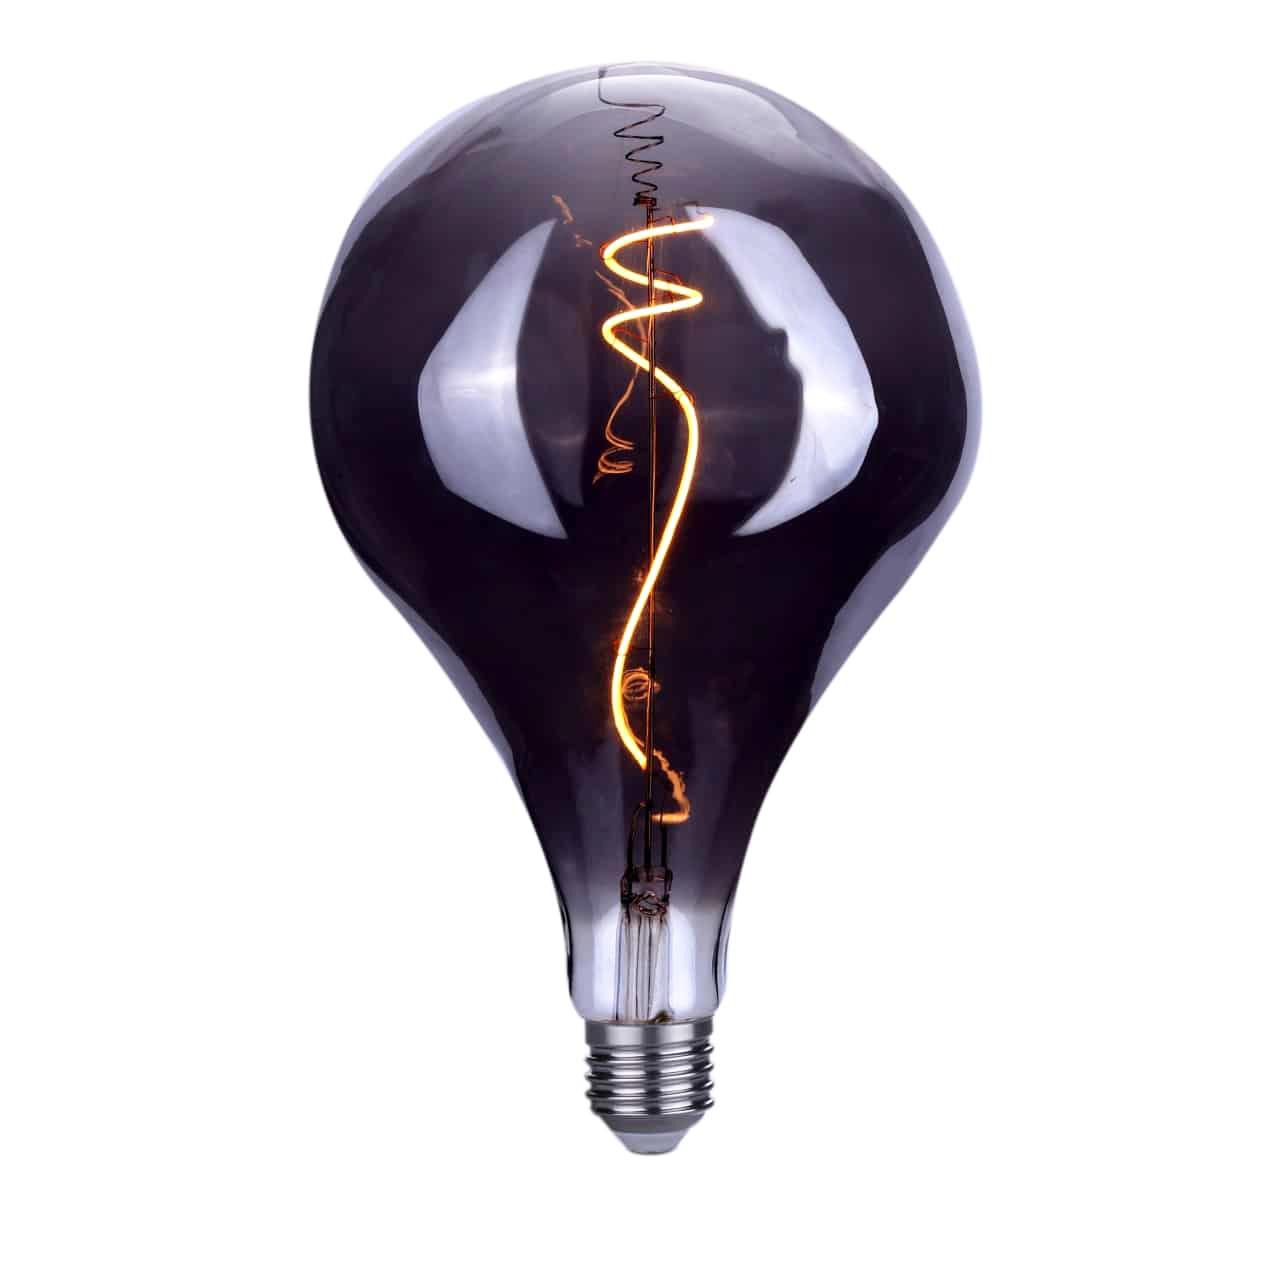 Highlight Lamp LED XXL Deuk 16,5x27,5 cm 6W 100 LM 2200K DIM Rook